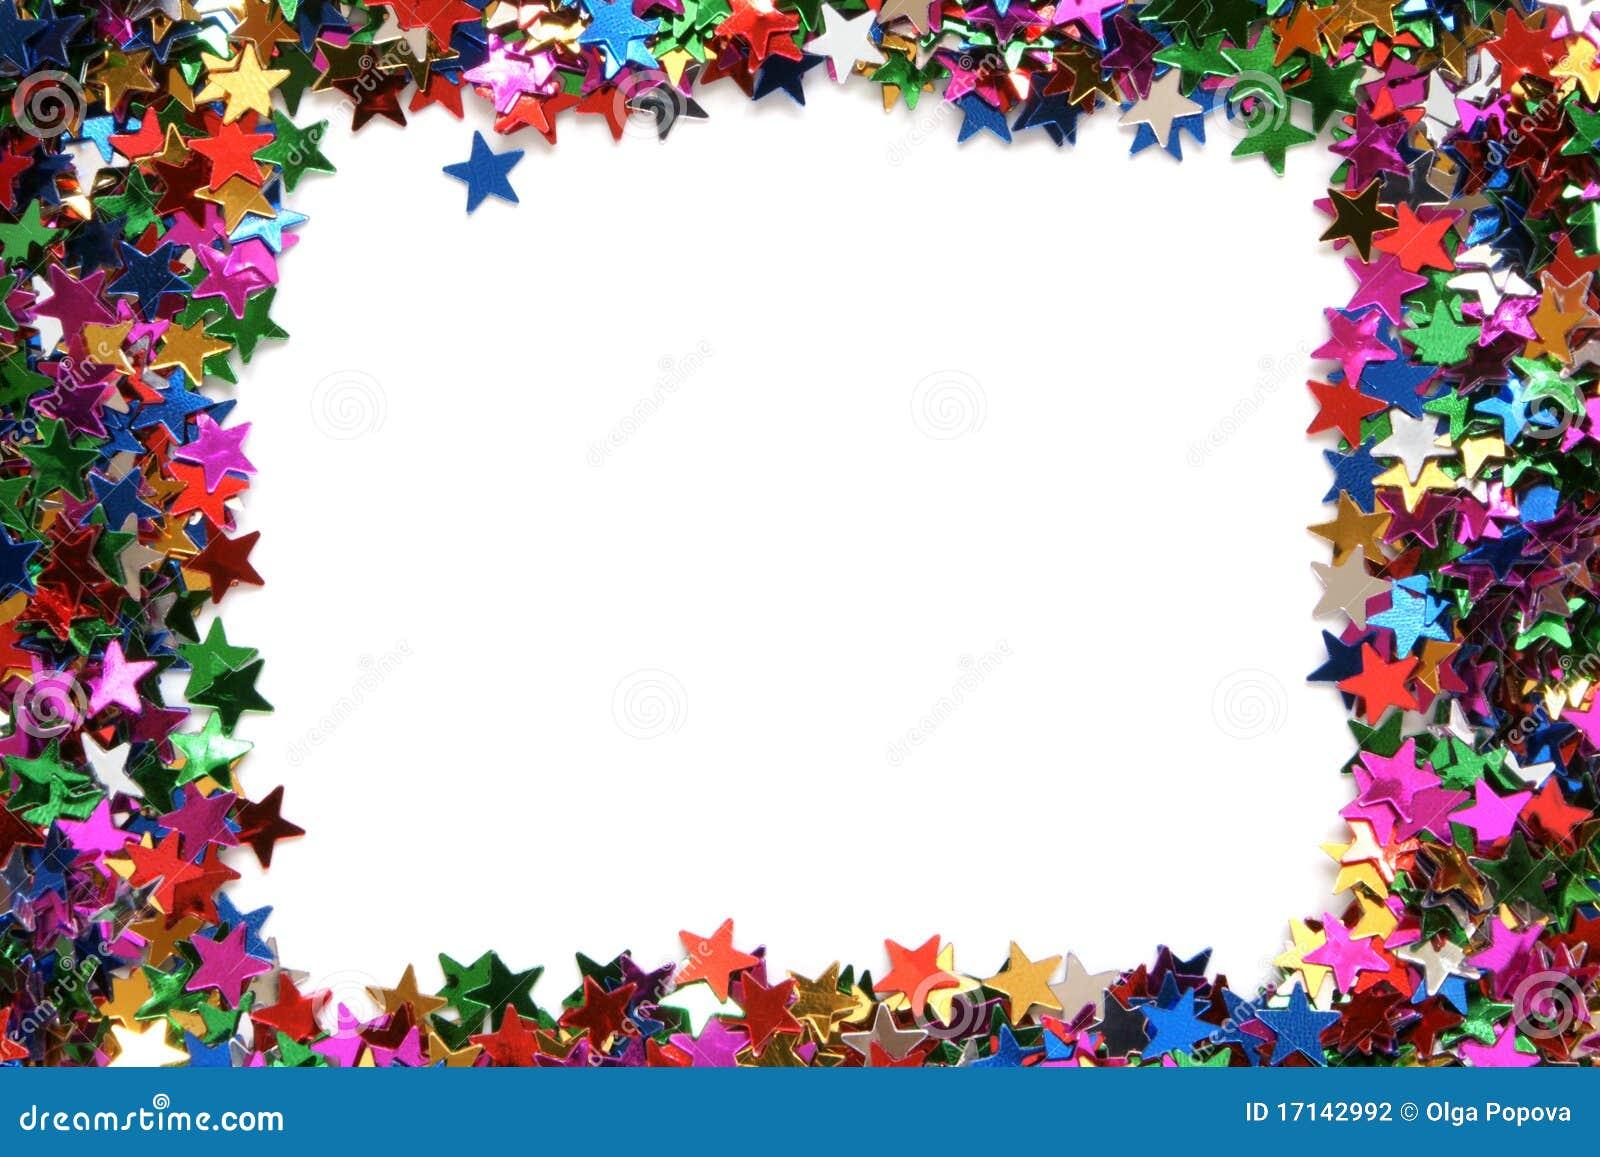 Celebration Stars Frame Stock Photography - Image: 17142992